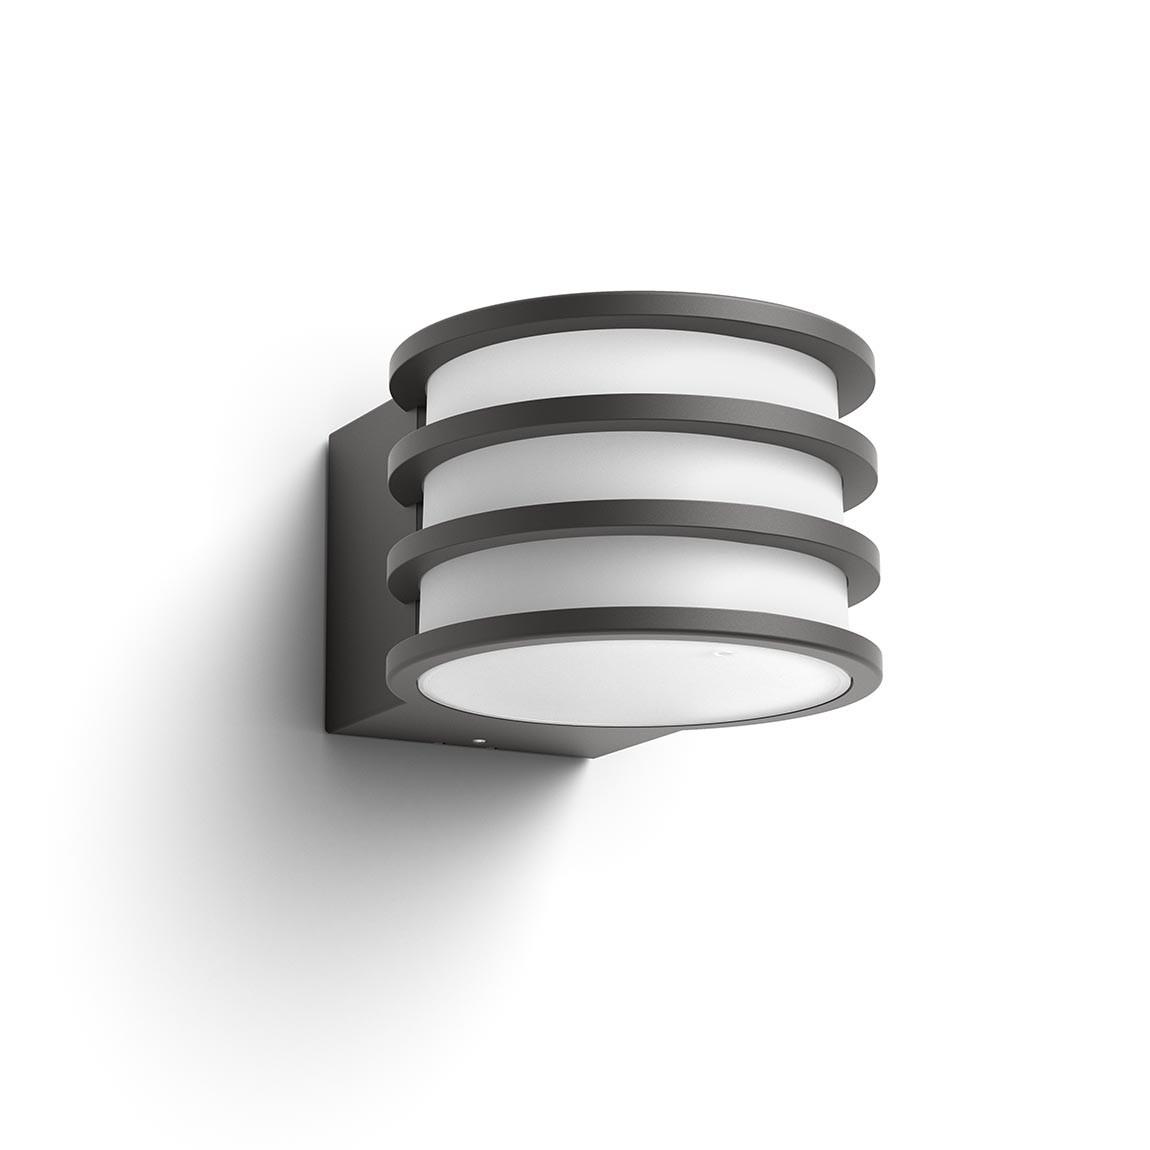 Philips Hue LED Lucca Wandleuchte - Anthrazit Produktbild